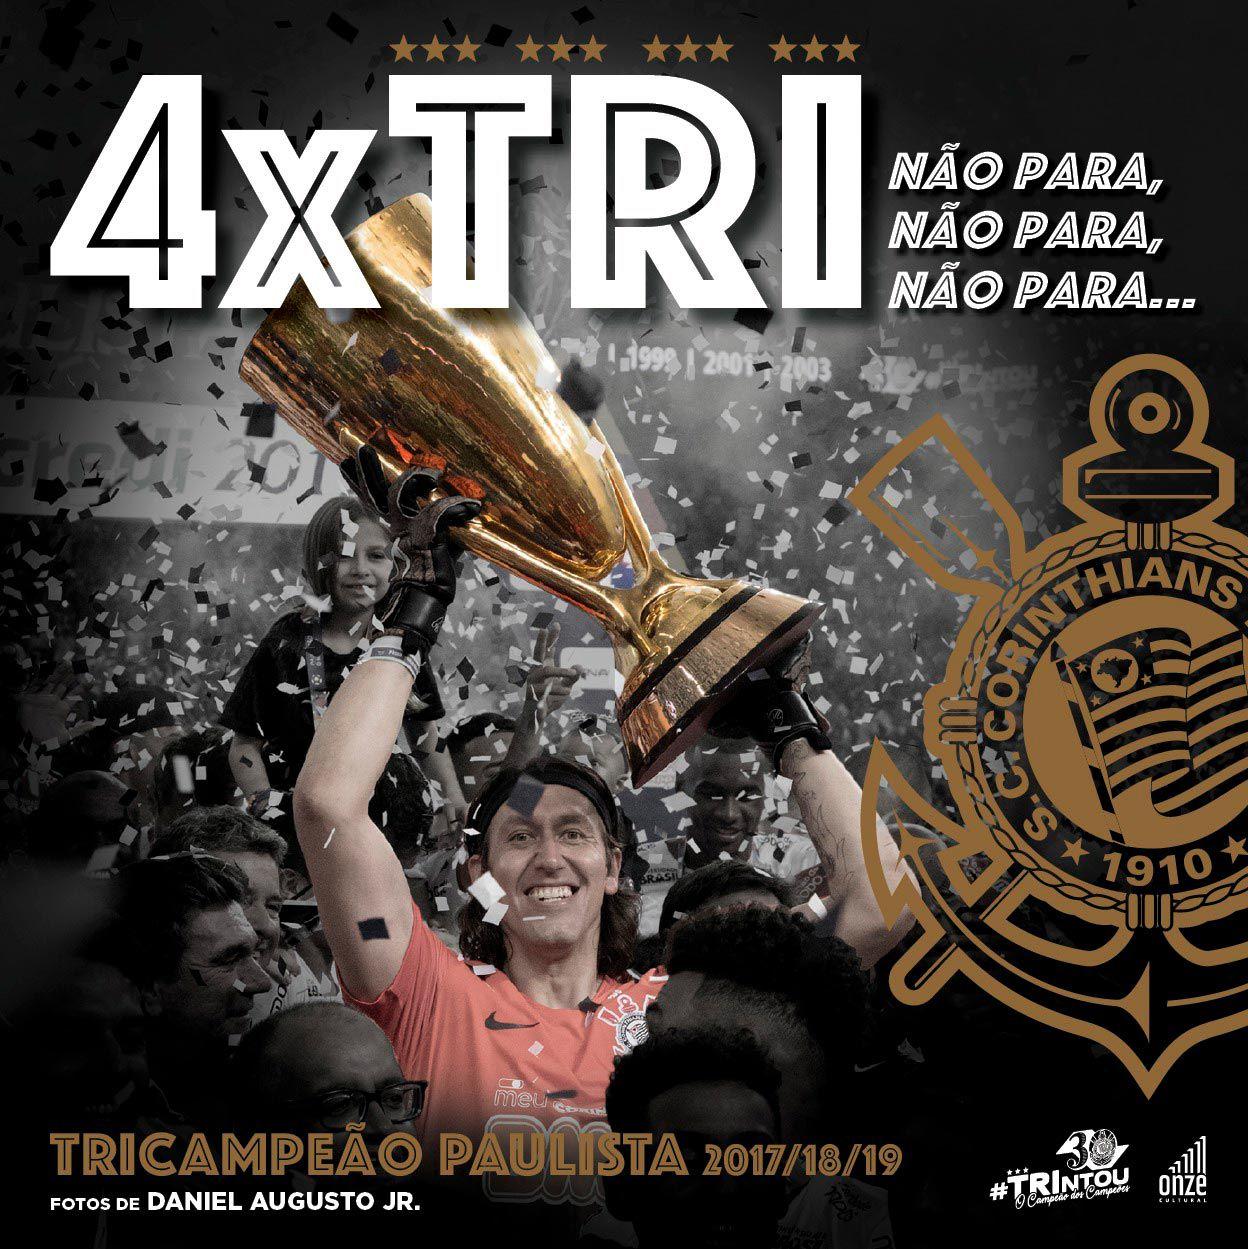 4 x TRI – Corinthians Tricampeão Paulista 2017/18/19